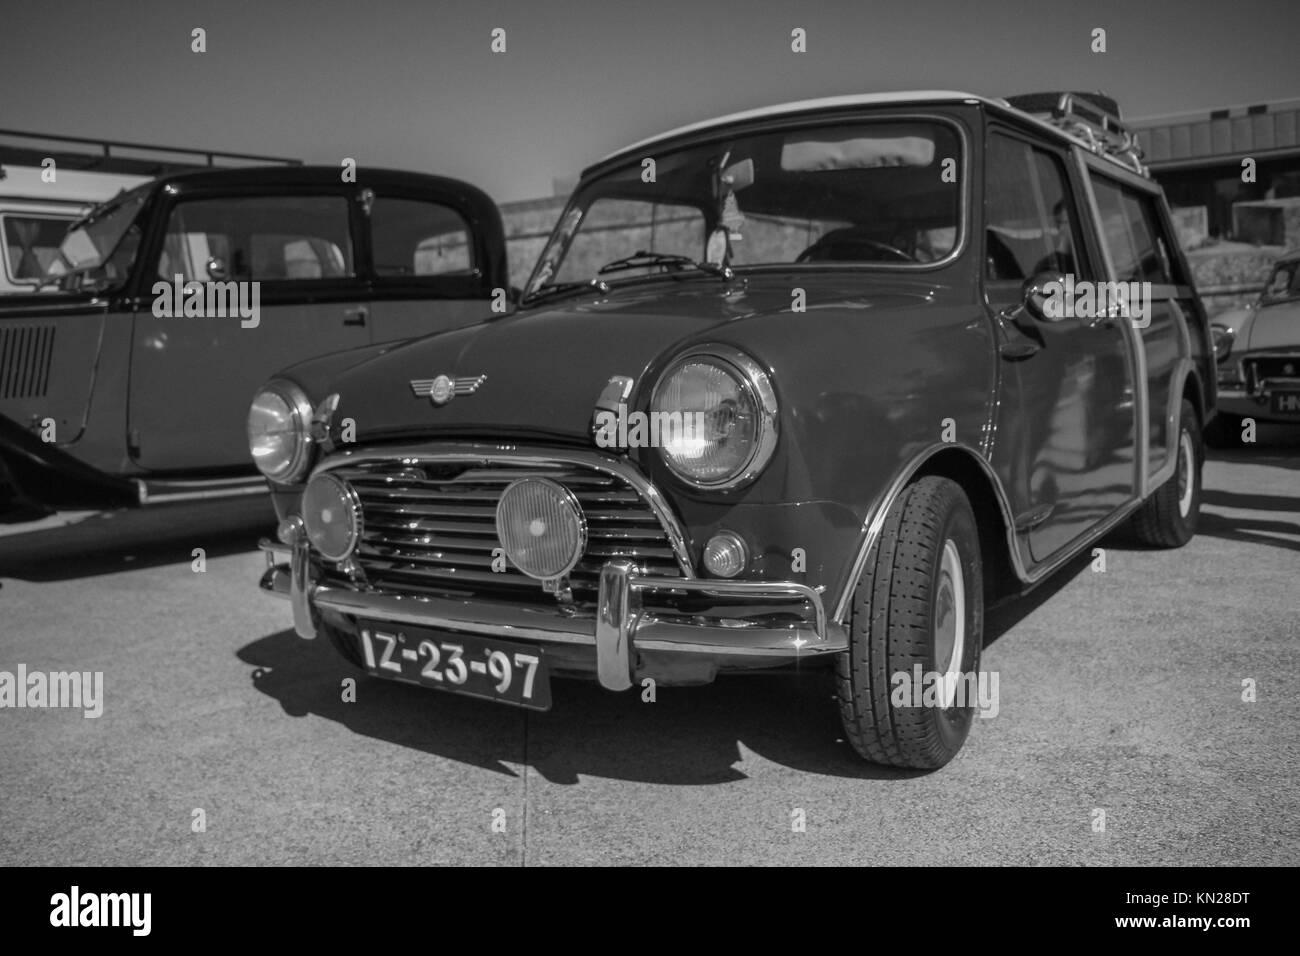 classic Austin Mini Cooper retro vehicle parked - Stock Image